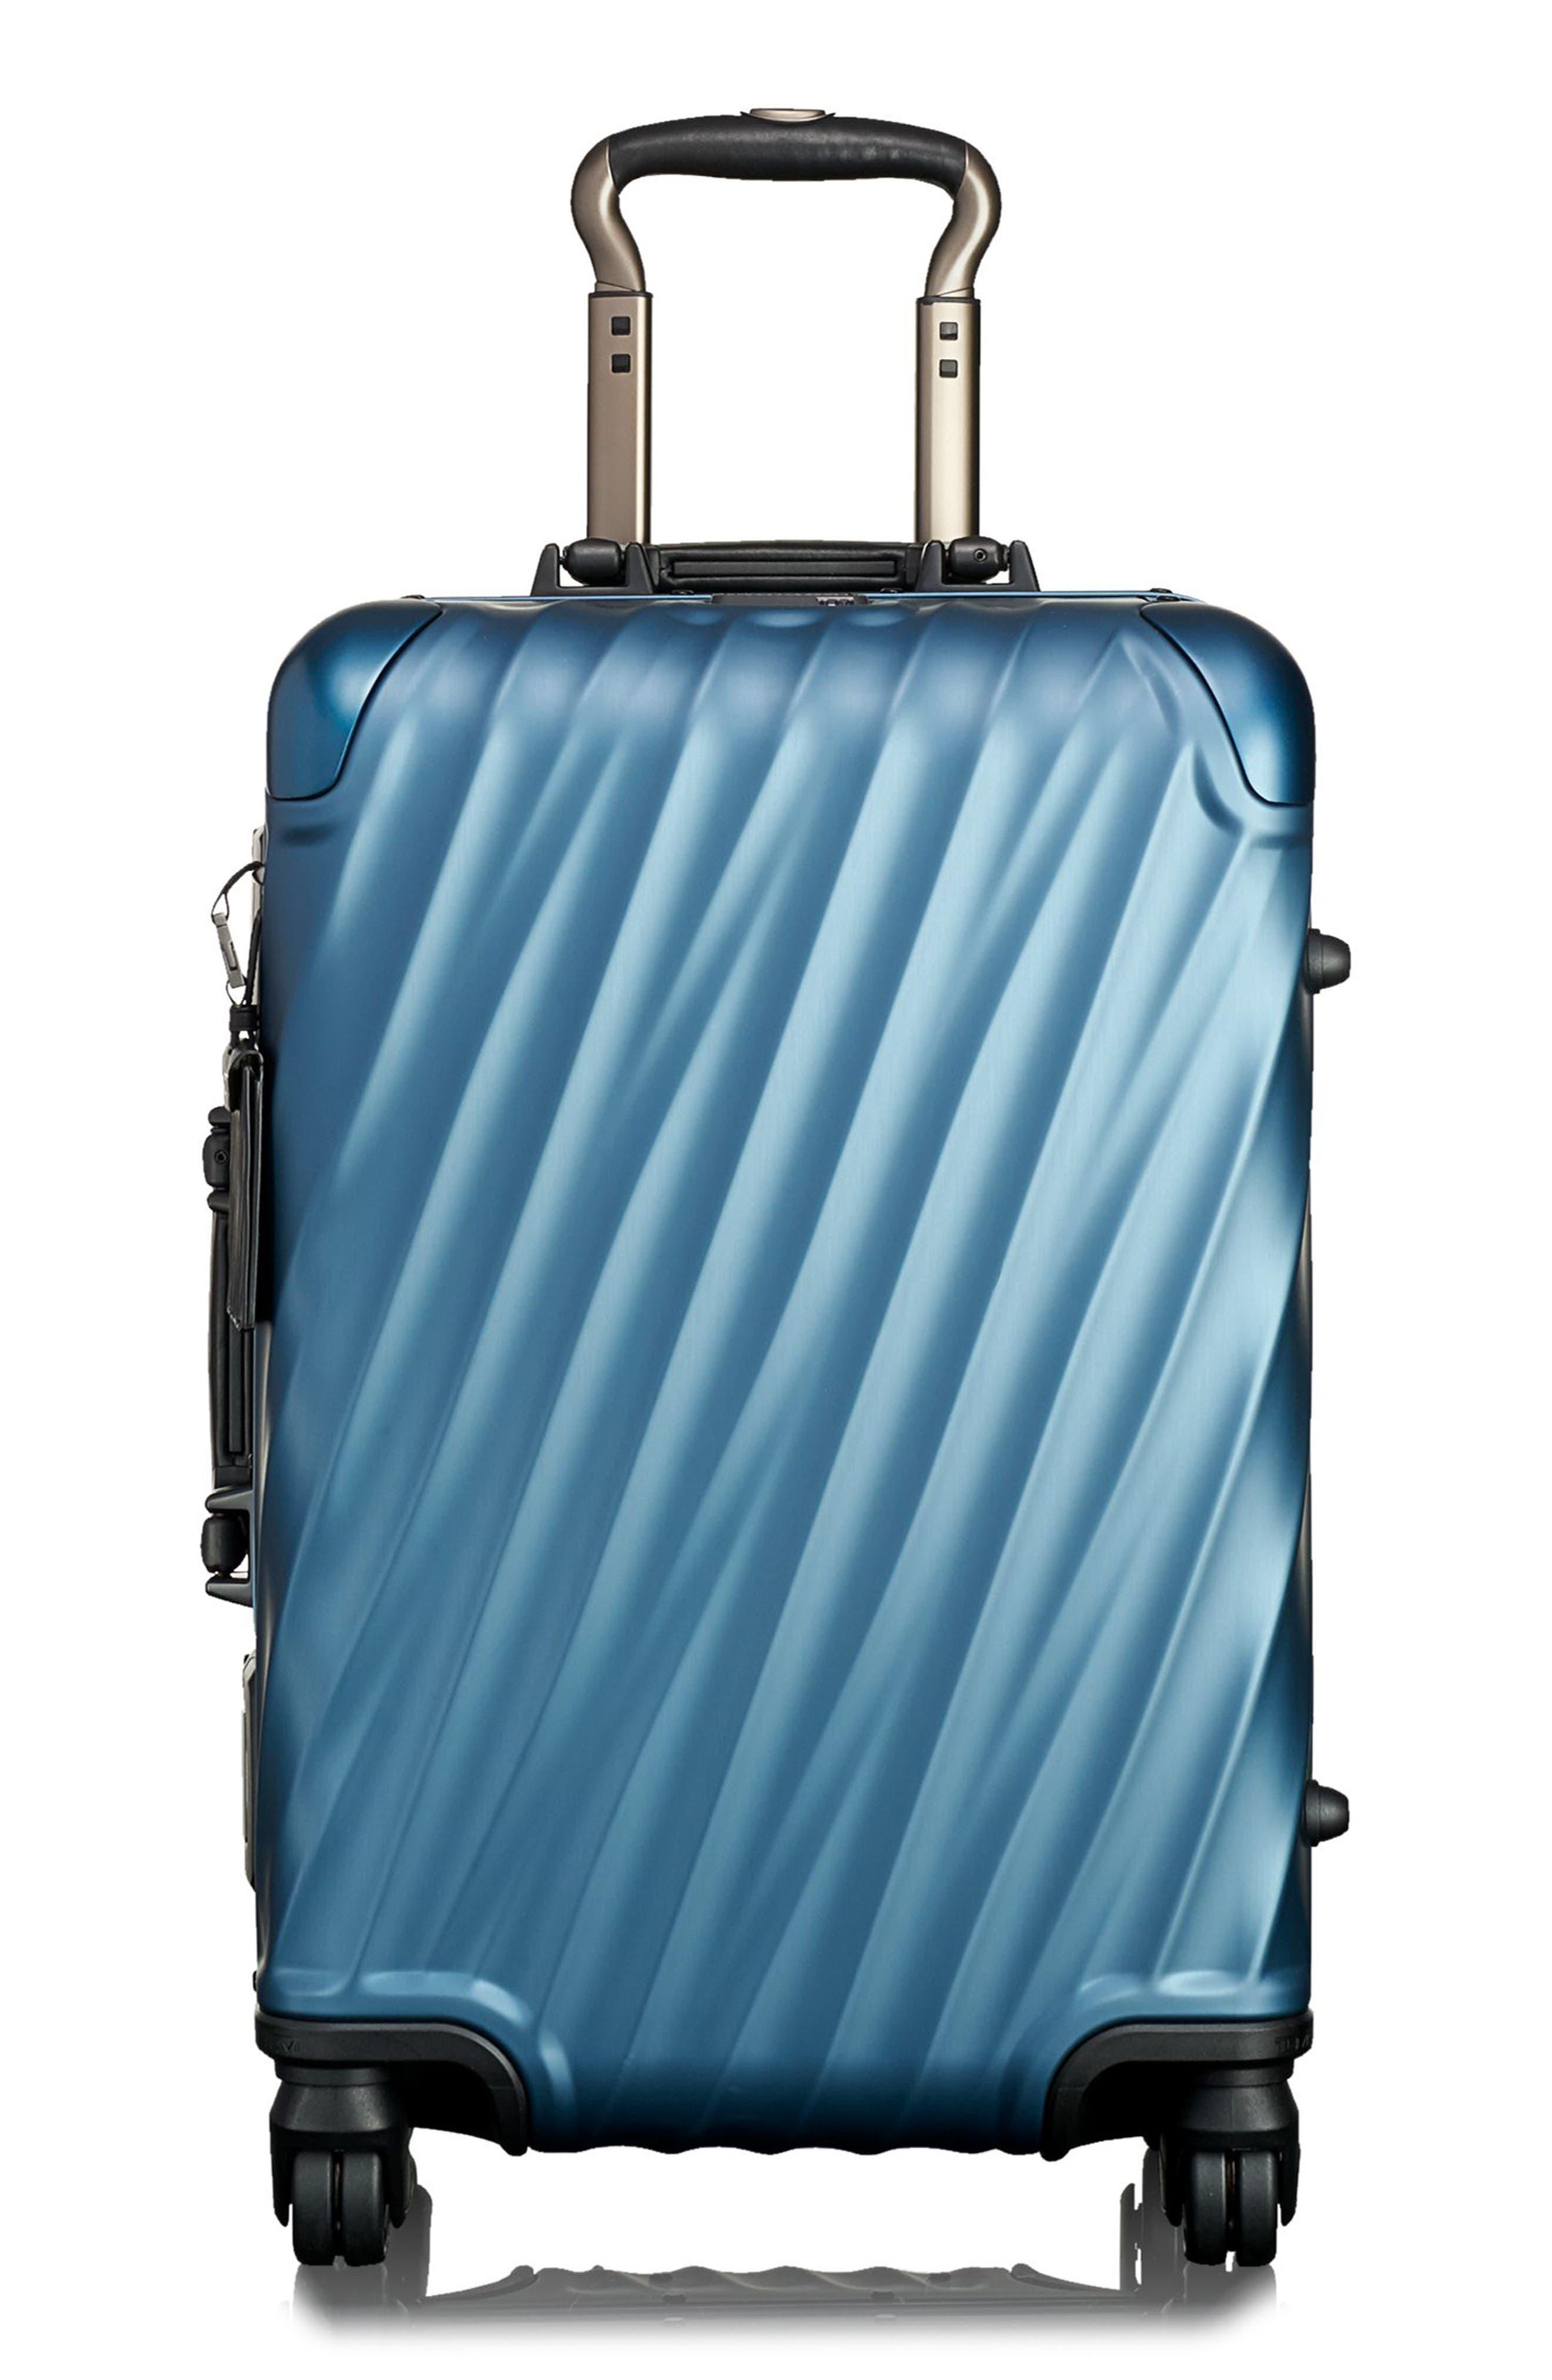 19 Degree 22 Inch International Wheeled Aluminum Carry-On,                             Main thumbnail 1, color,                             Blue